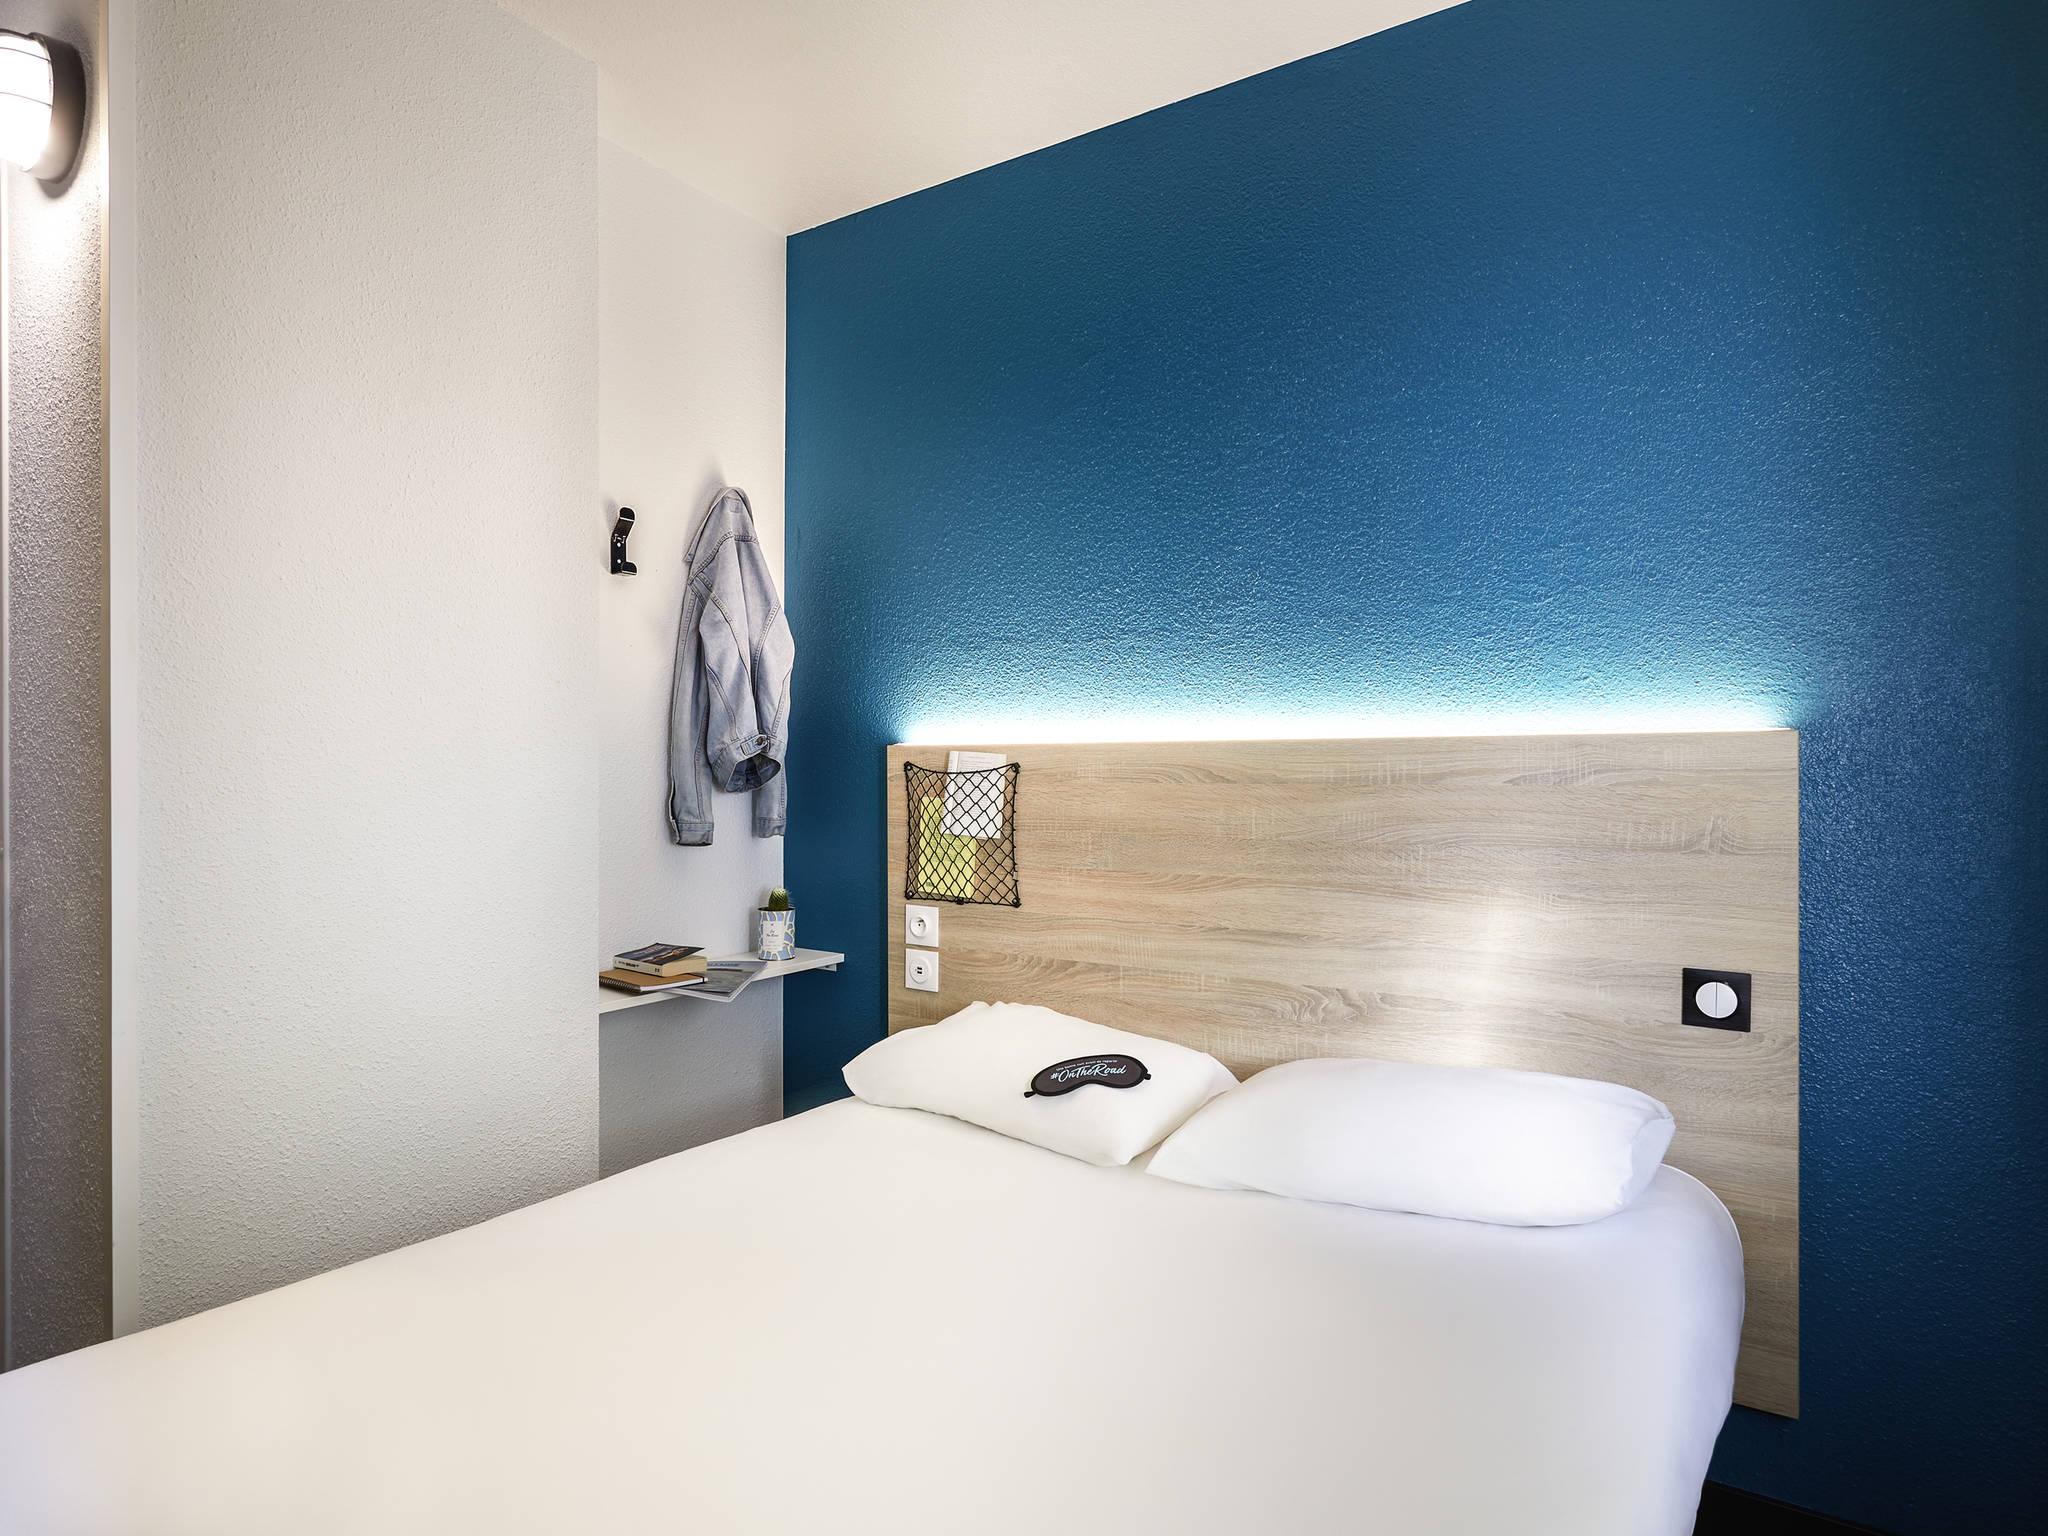 Отель — hotelF1 Mulhouse Centre Ouest